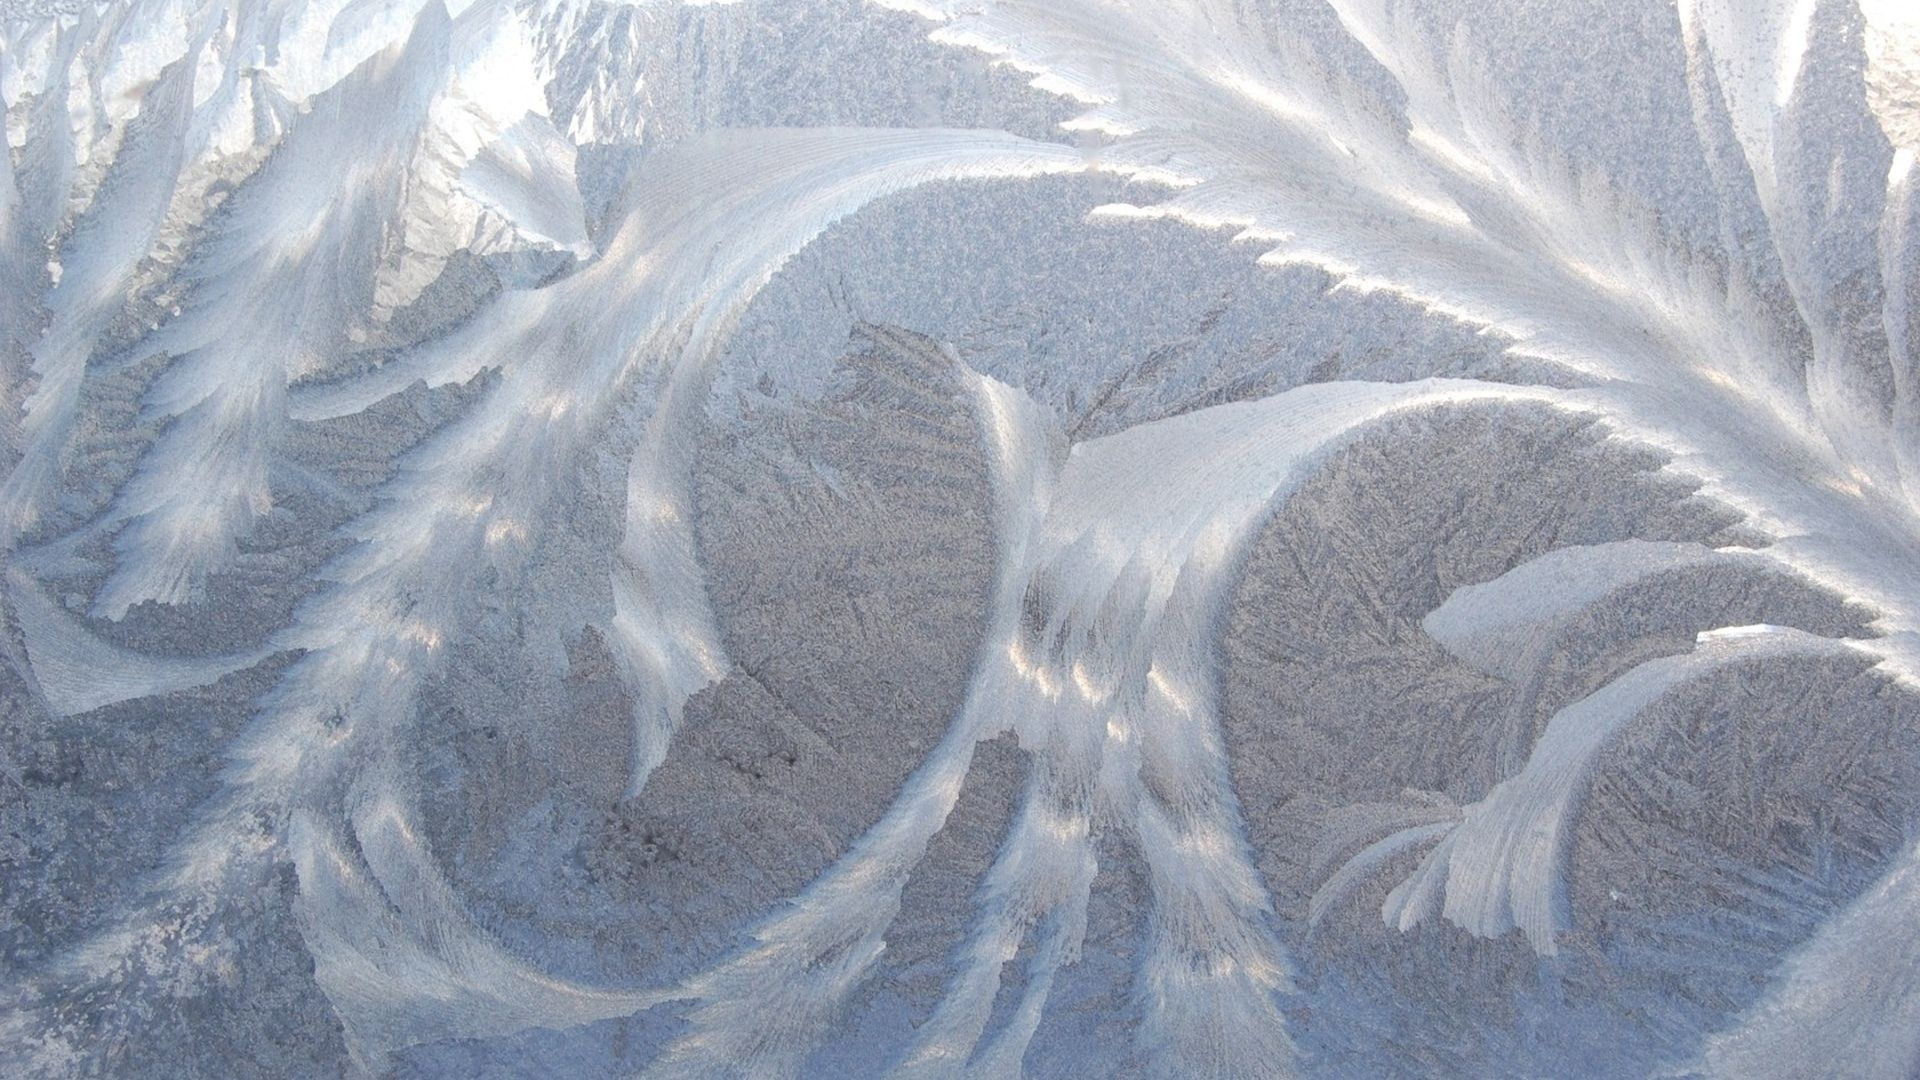 Winter Patterns On The Window Free Download Wallpaper